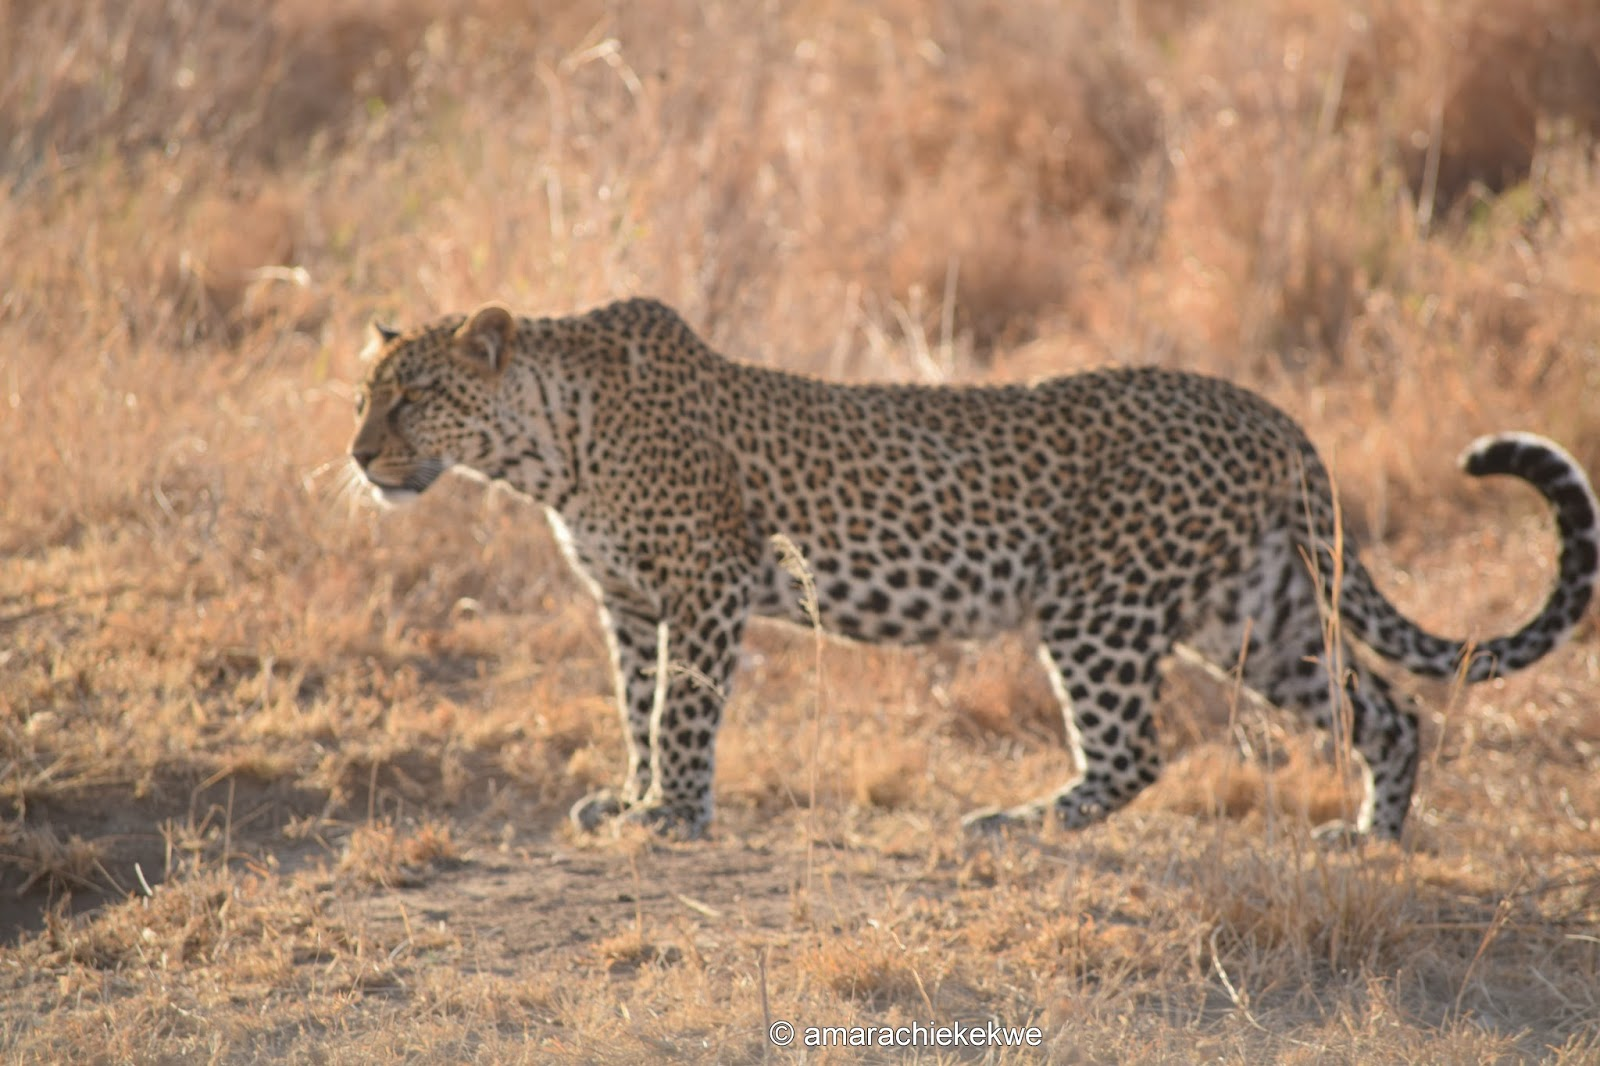 https://i0.wp.com/4.bp.blogspot.com/-vMIOV-qHZAY/V9rSSOcpnwI/AAAAAAAAVMw/KwEdxDa_gHkiUxFbEtHXEULBi7KYnJZgACPcB/s1600/leopard.jpg?resize=930%2C620&ssl=1